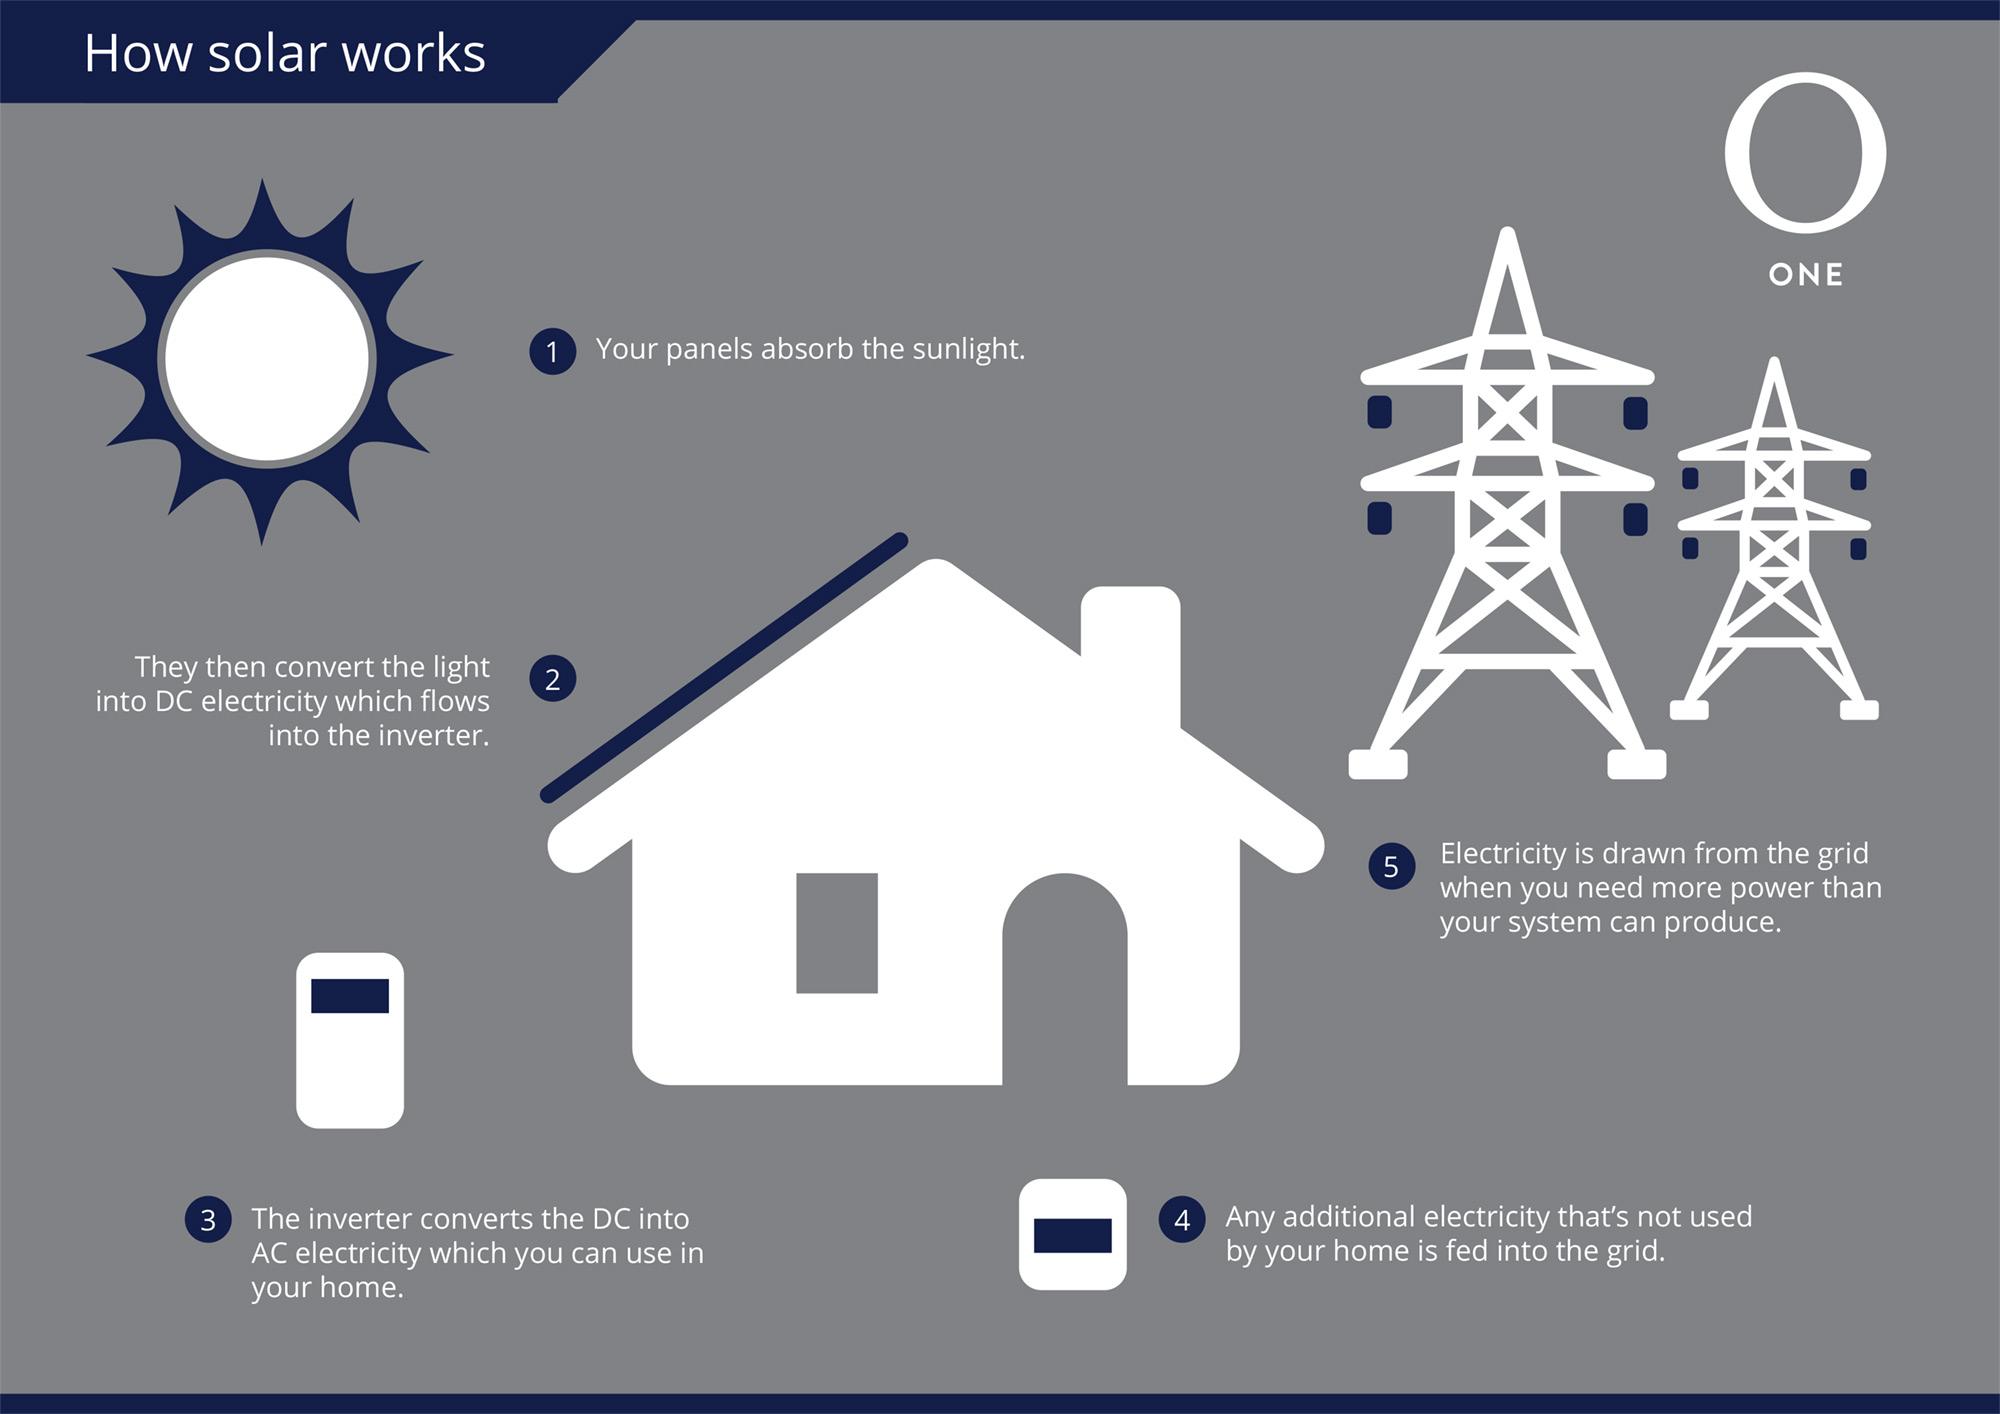 How Solar Works Illustration